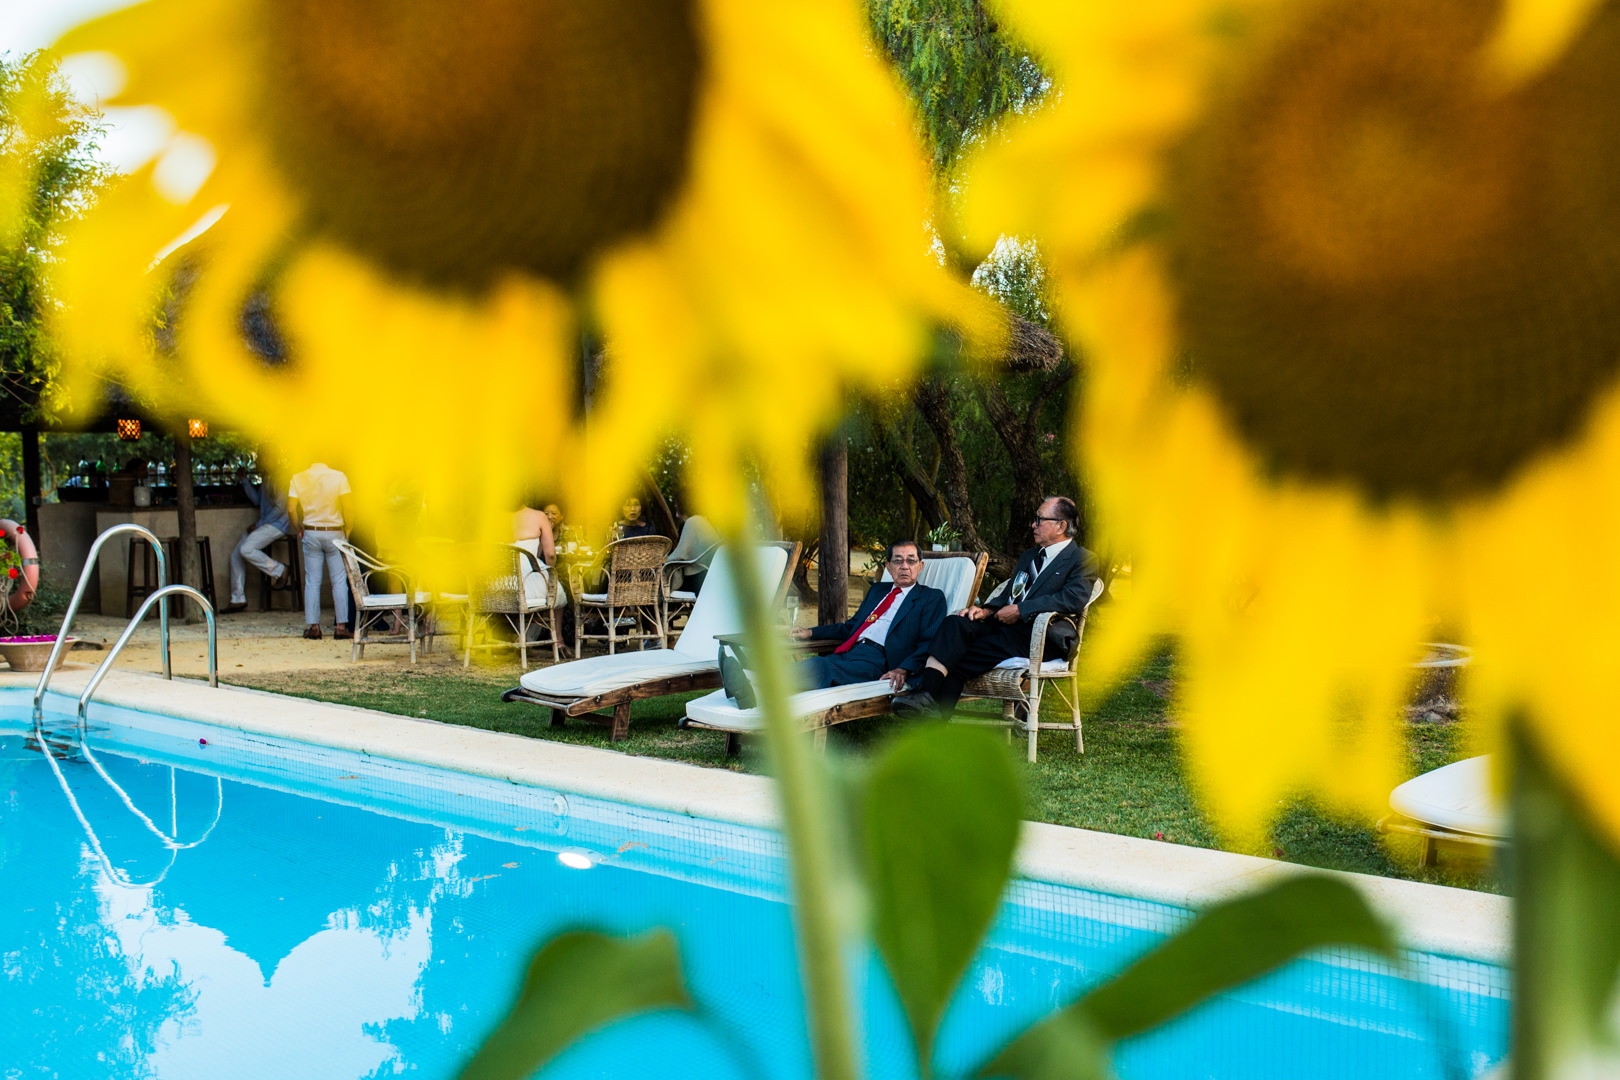 Boda-Hacienda-San-Rafael-Sevilla-engagement-Rafael-Torres-fotografo-bodas-sevilla-madrid-barcelona-wedding-photographer--64.jpg